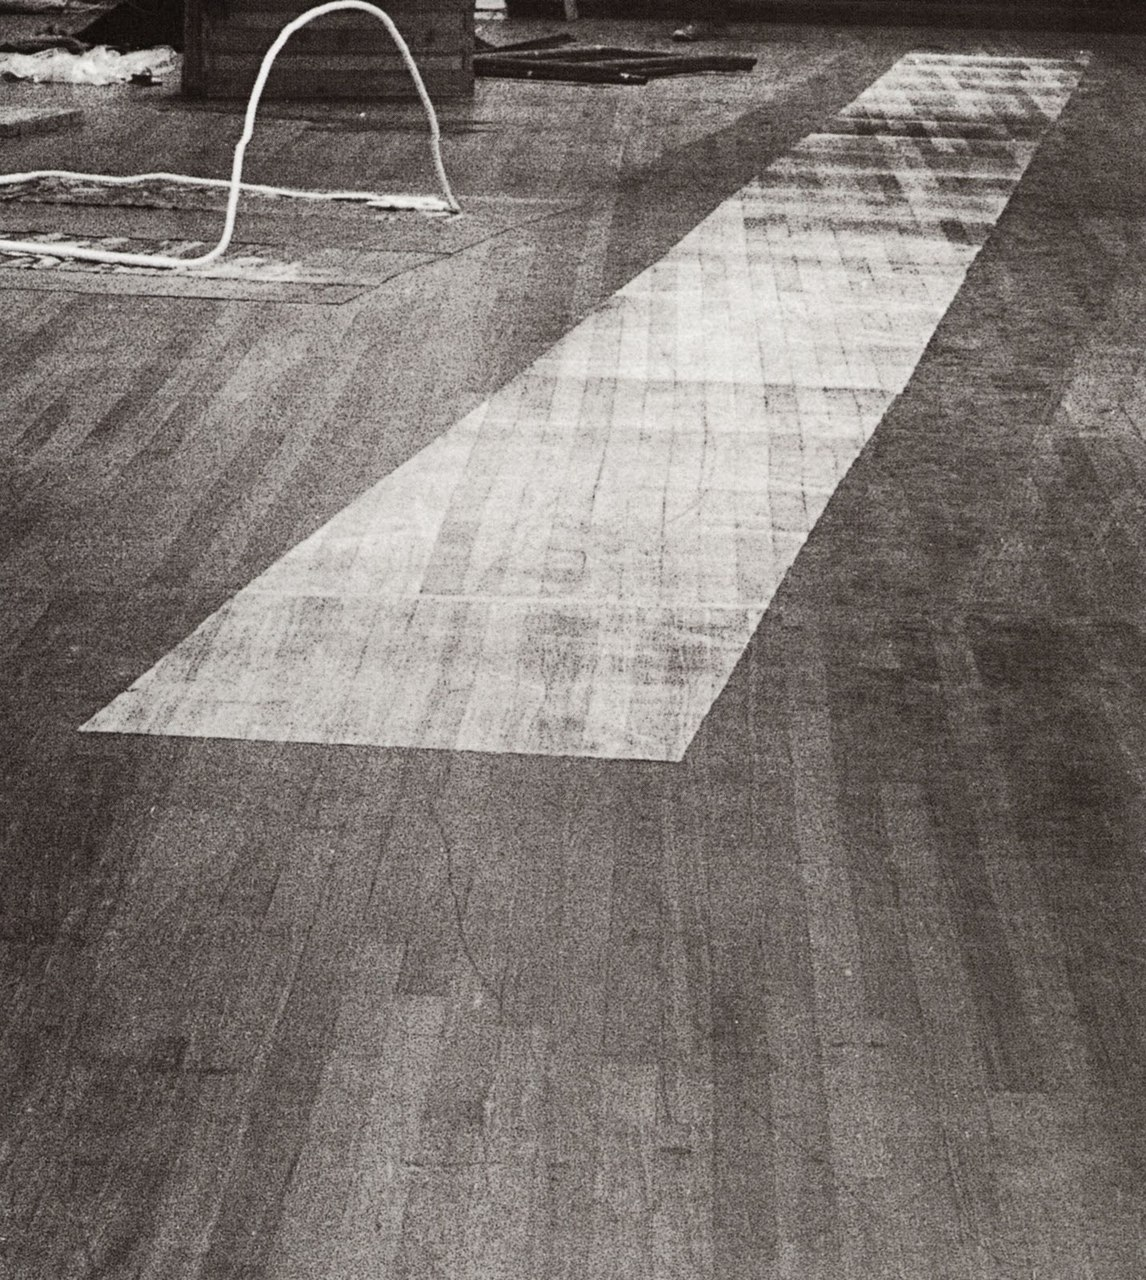 Photopath 1967-69